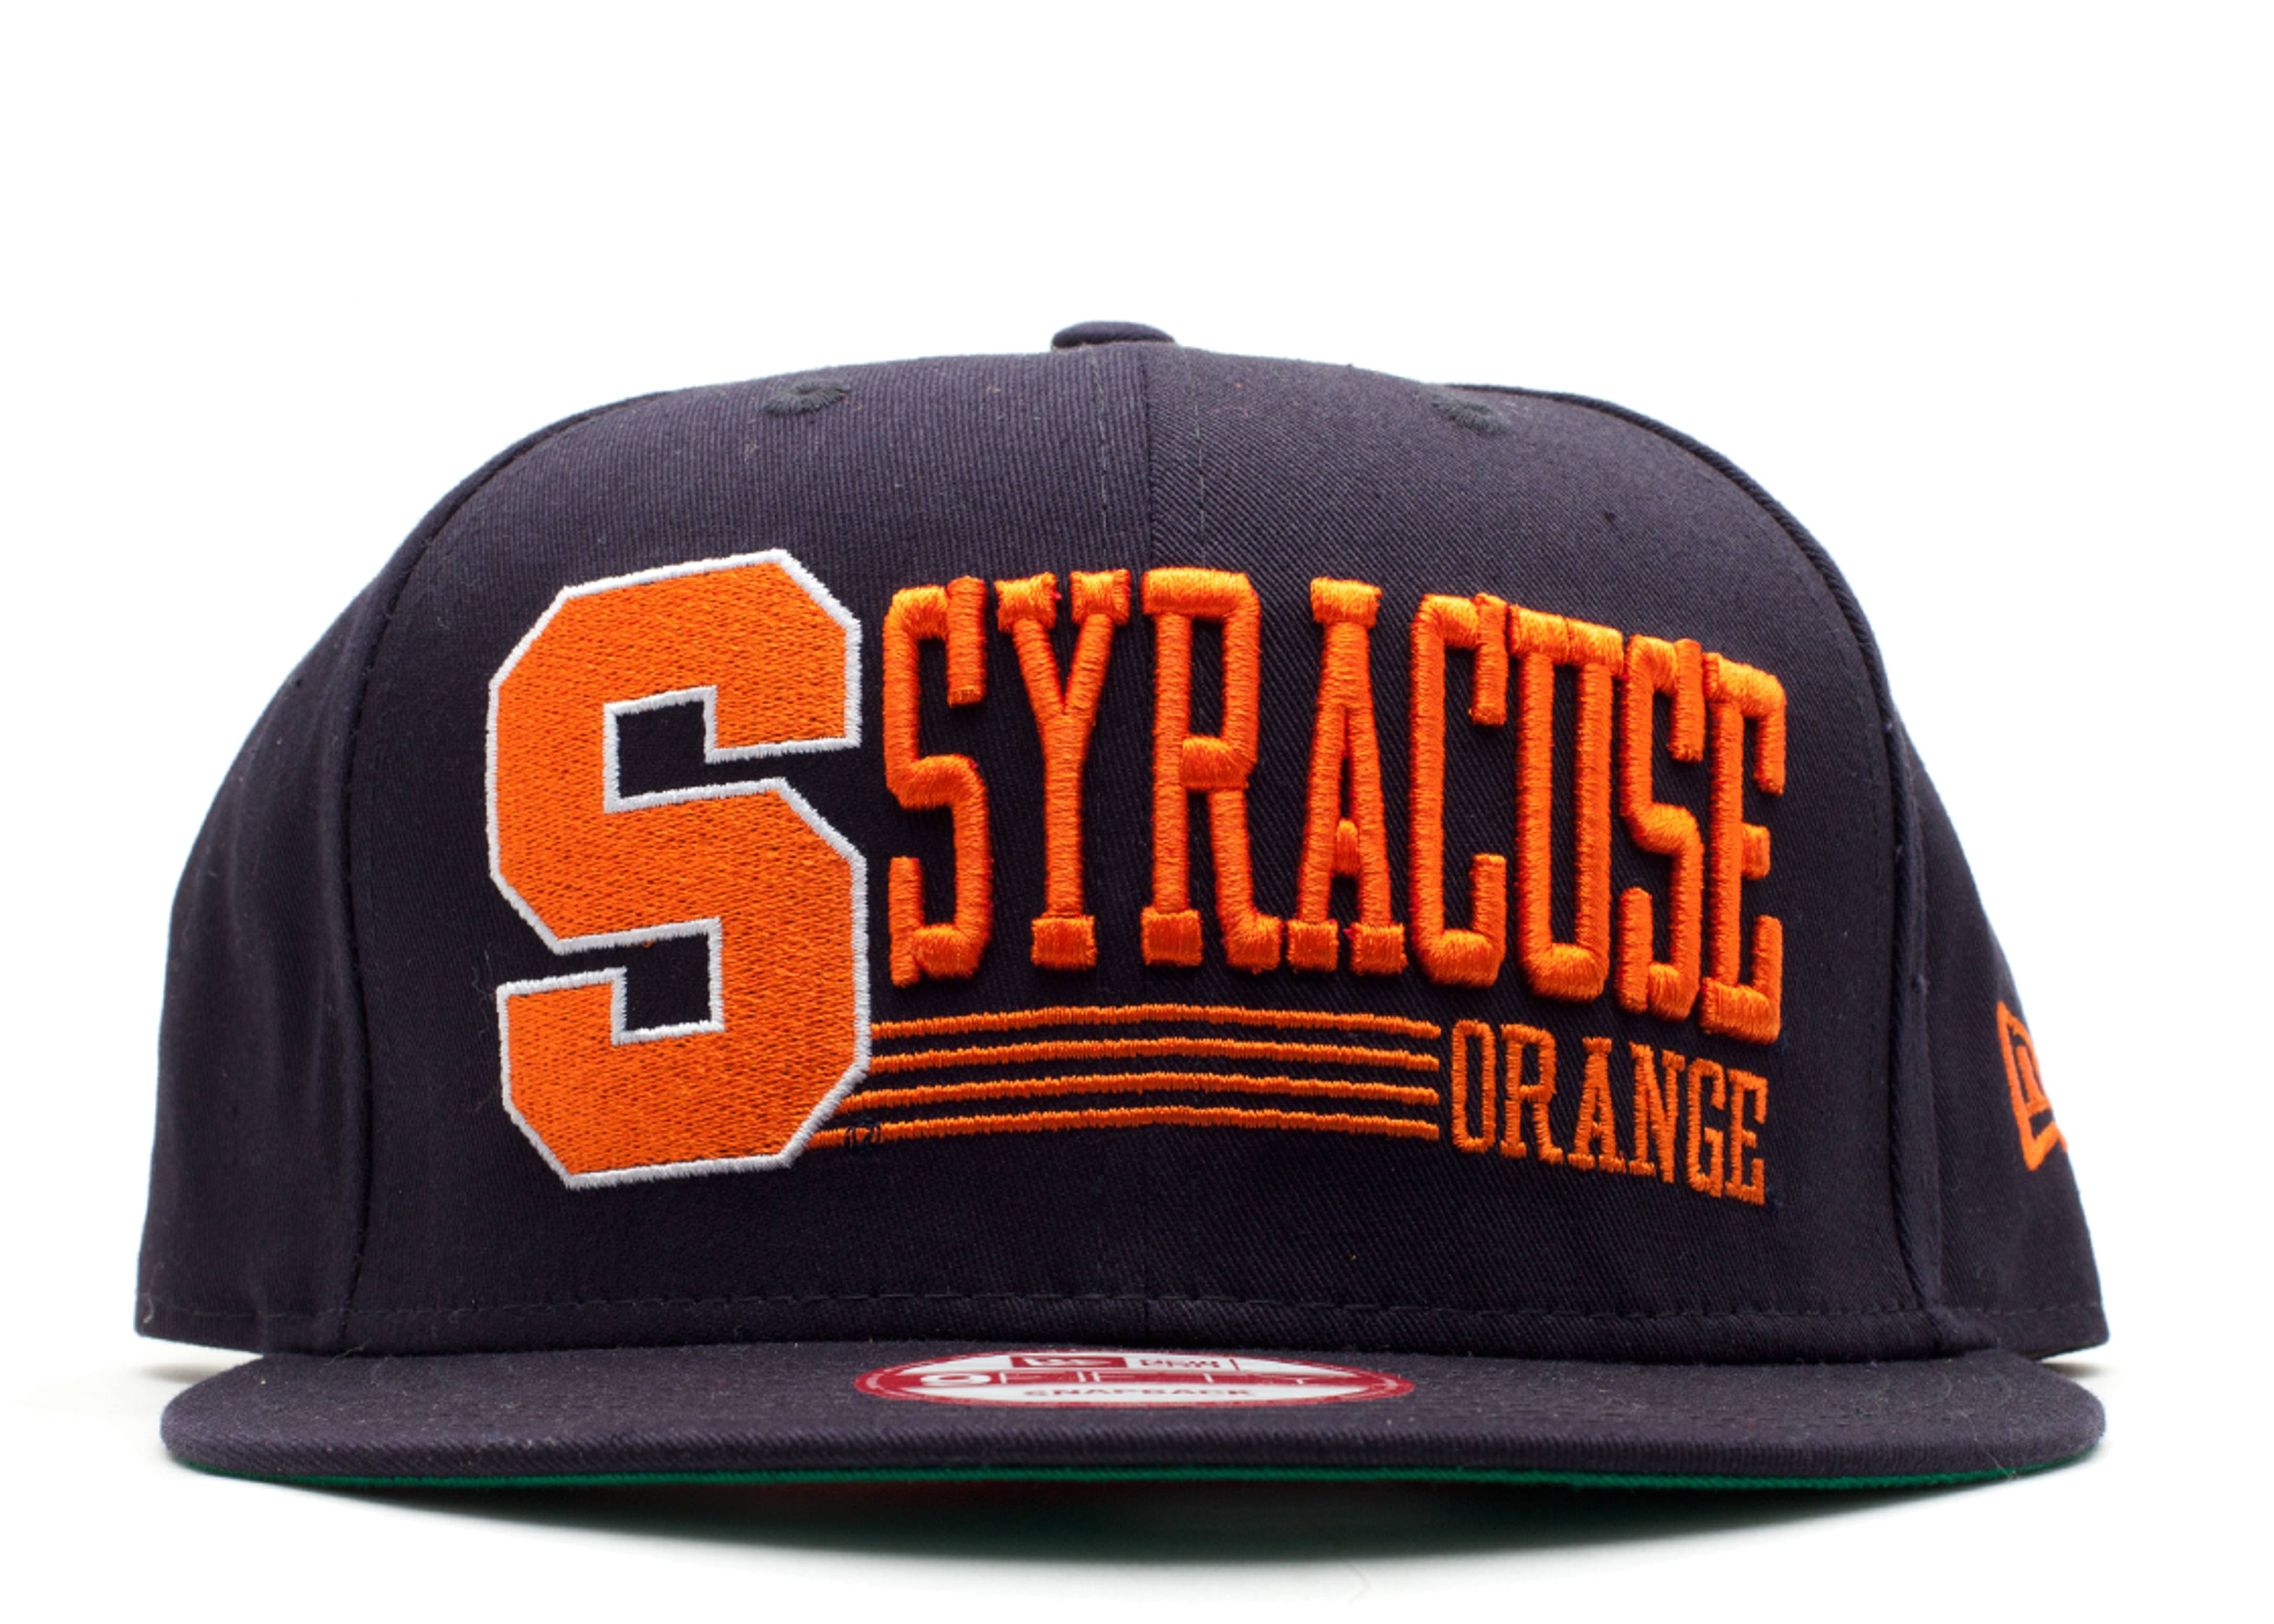 syracuse orangemen snap-back